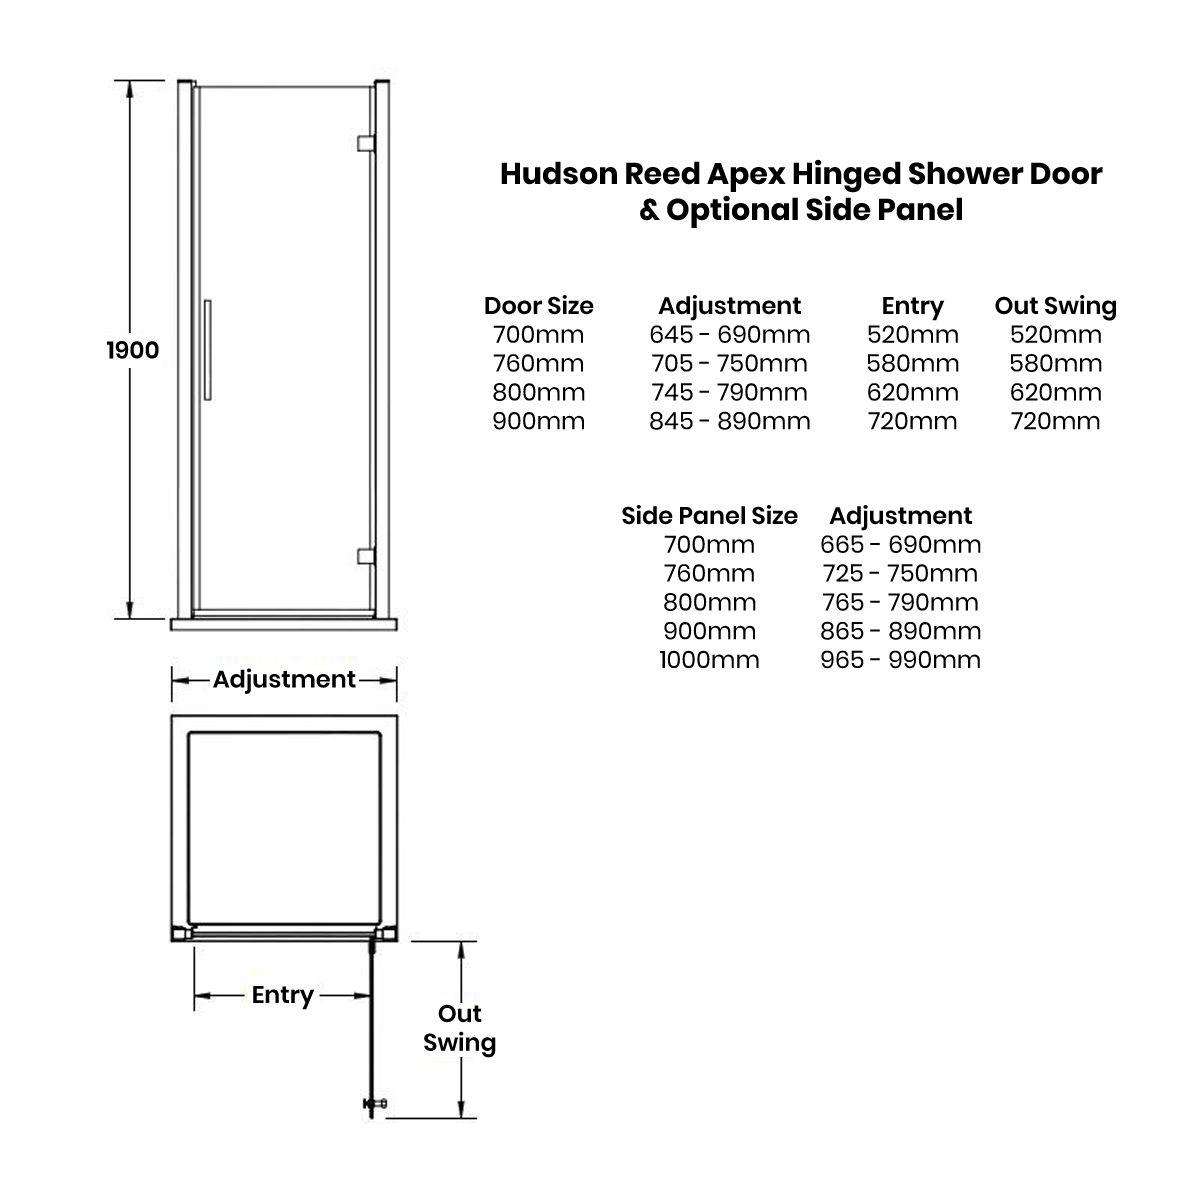 Hudson Reed Apex Hinged Shower Enclosure Dimensions